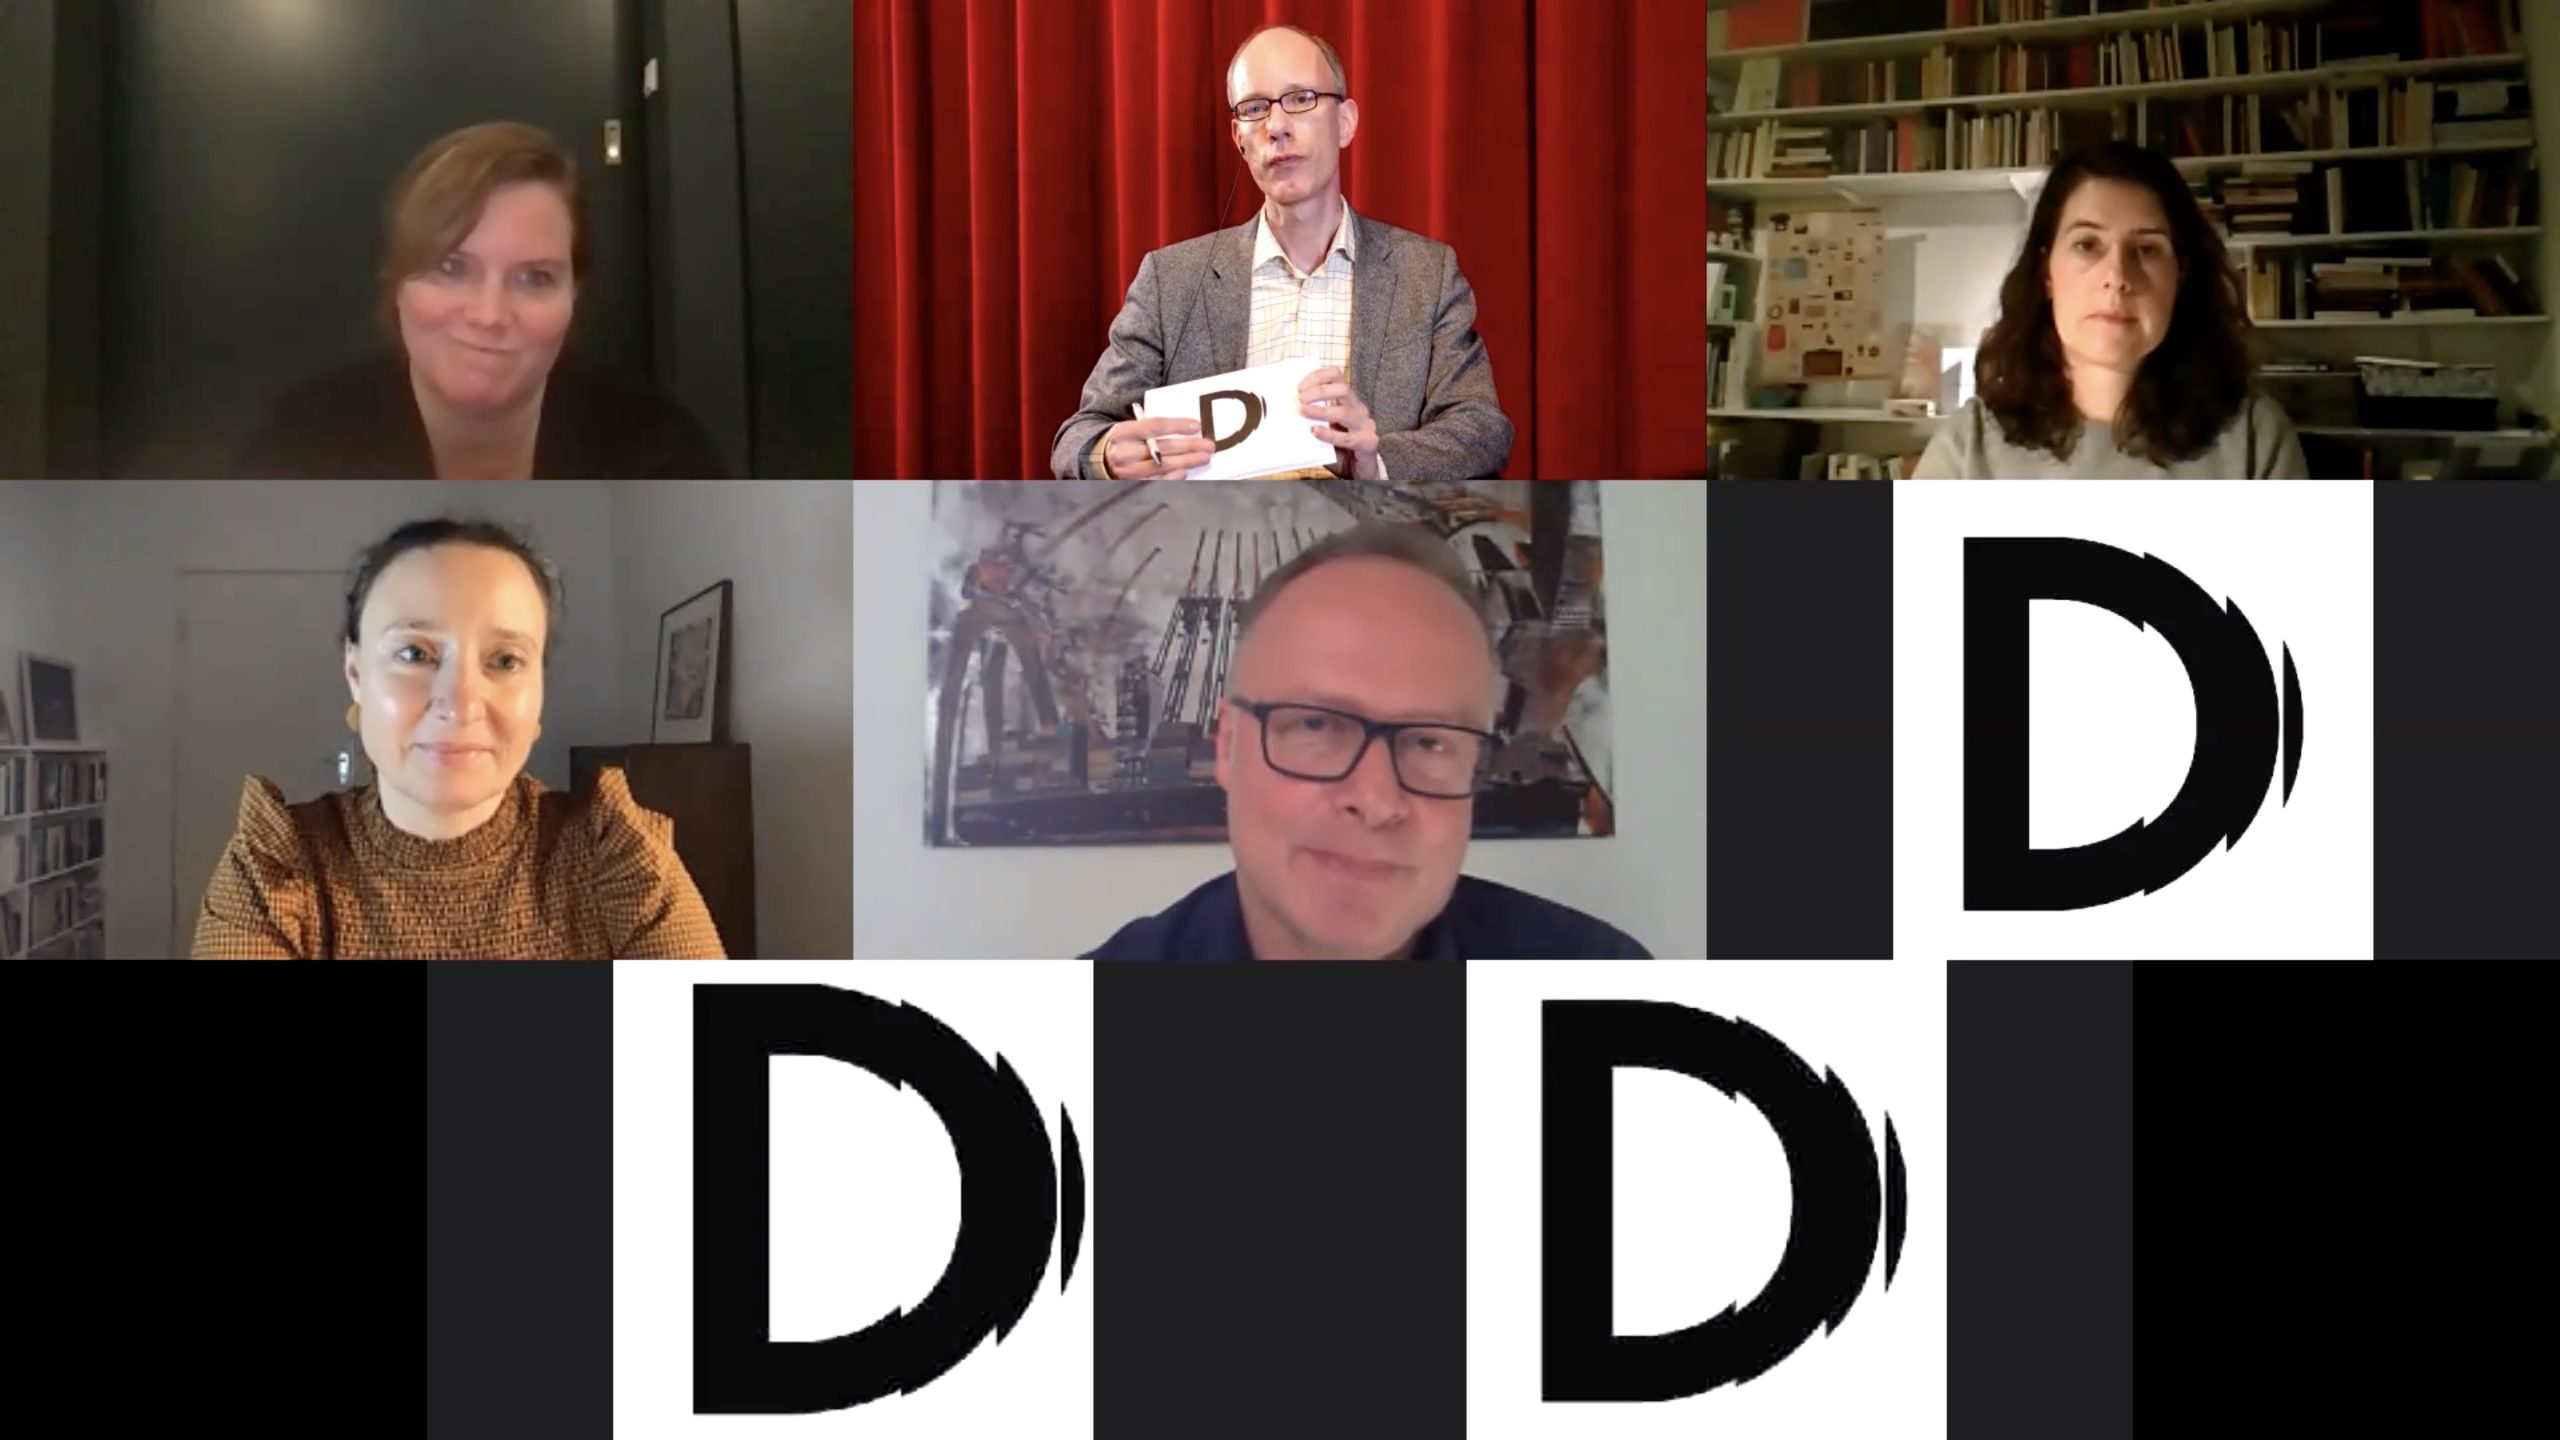 oben v.l. Eva Müller, Torsten Zarges, Hannah Pilarczyk, unten v. l. Jennifer Mival, Martin Spieker